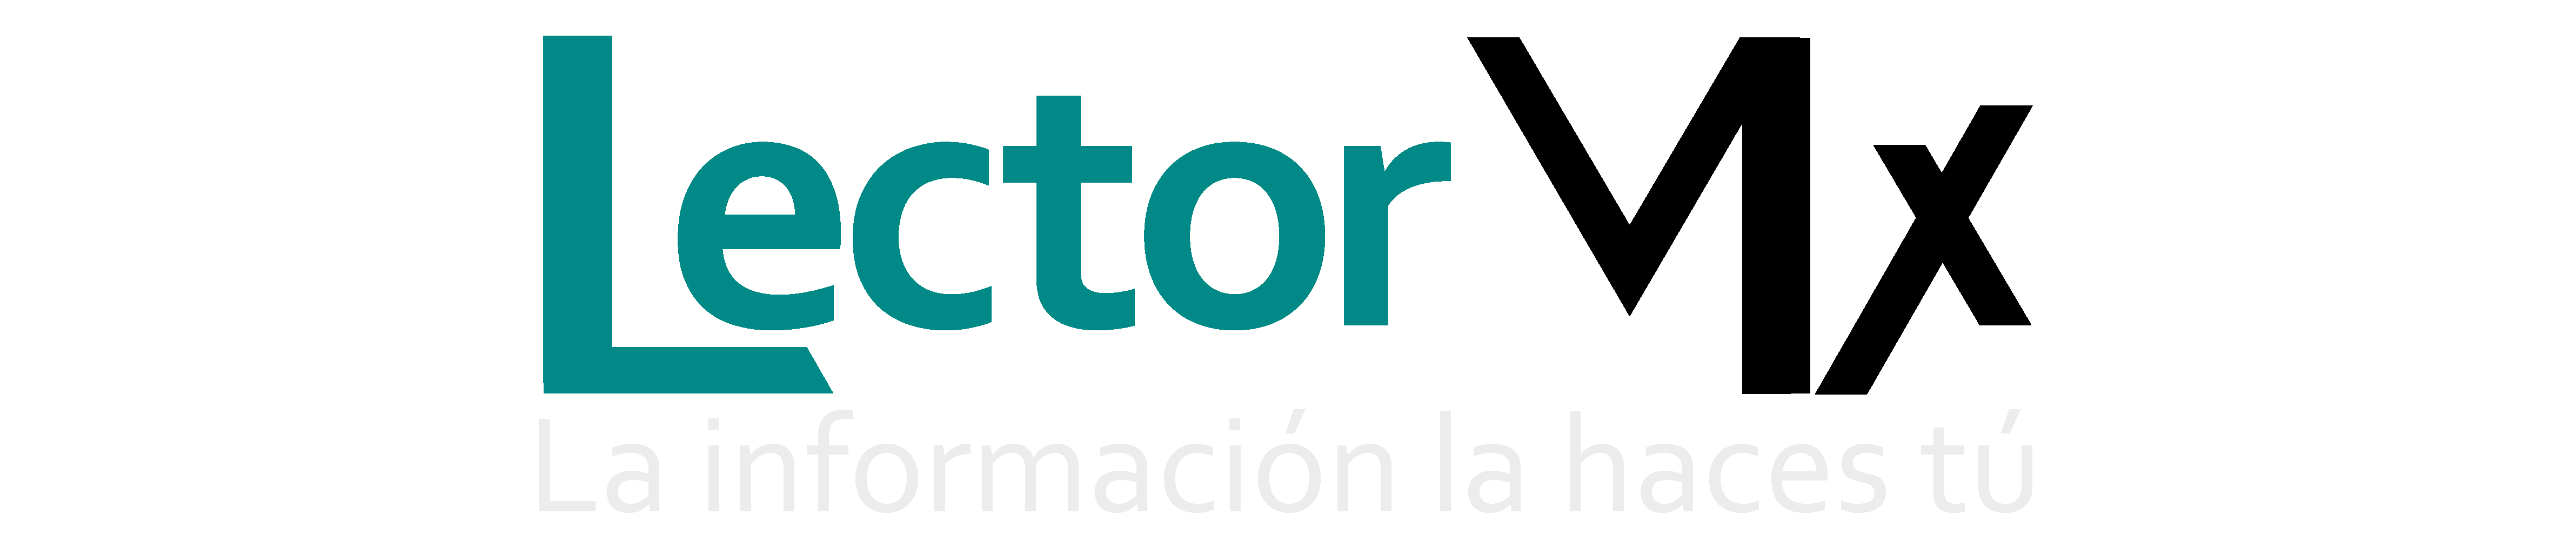 LectorMx